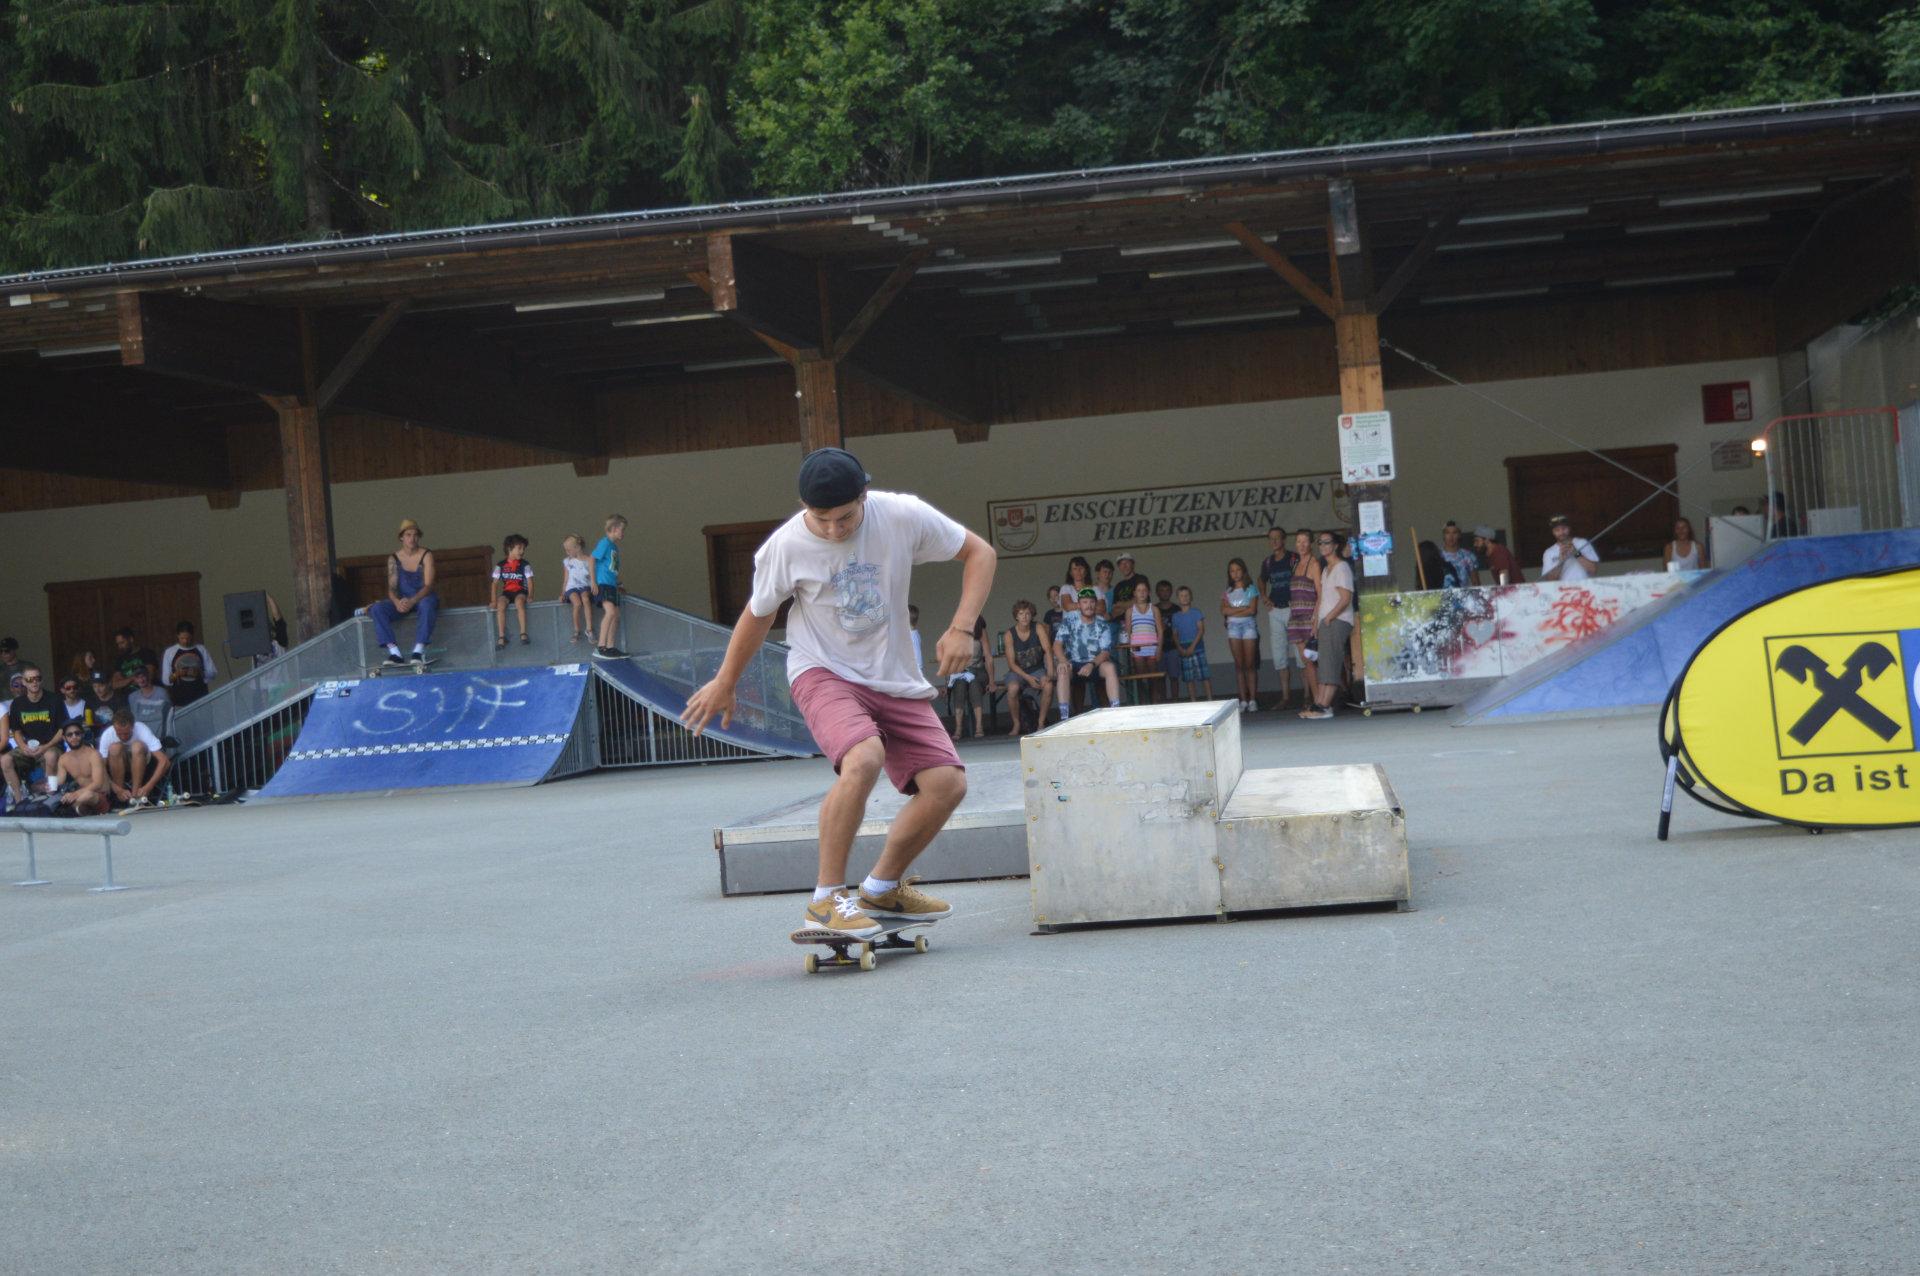 skateboardheadz fieberbrunn kitzgau trophy finale 2018 fieberbrunn 00126